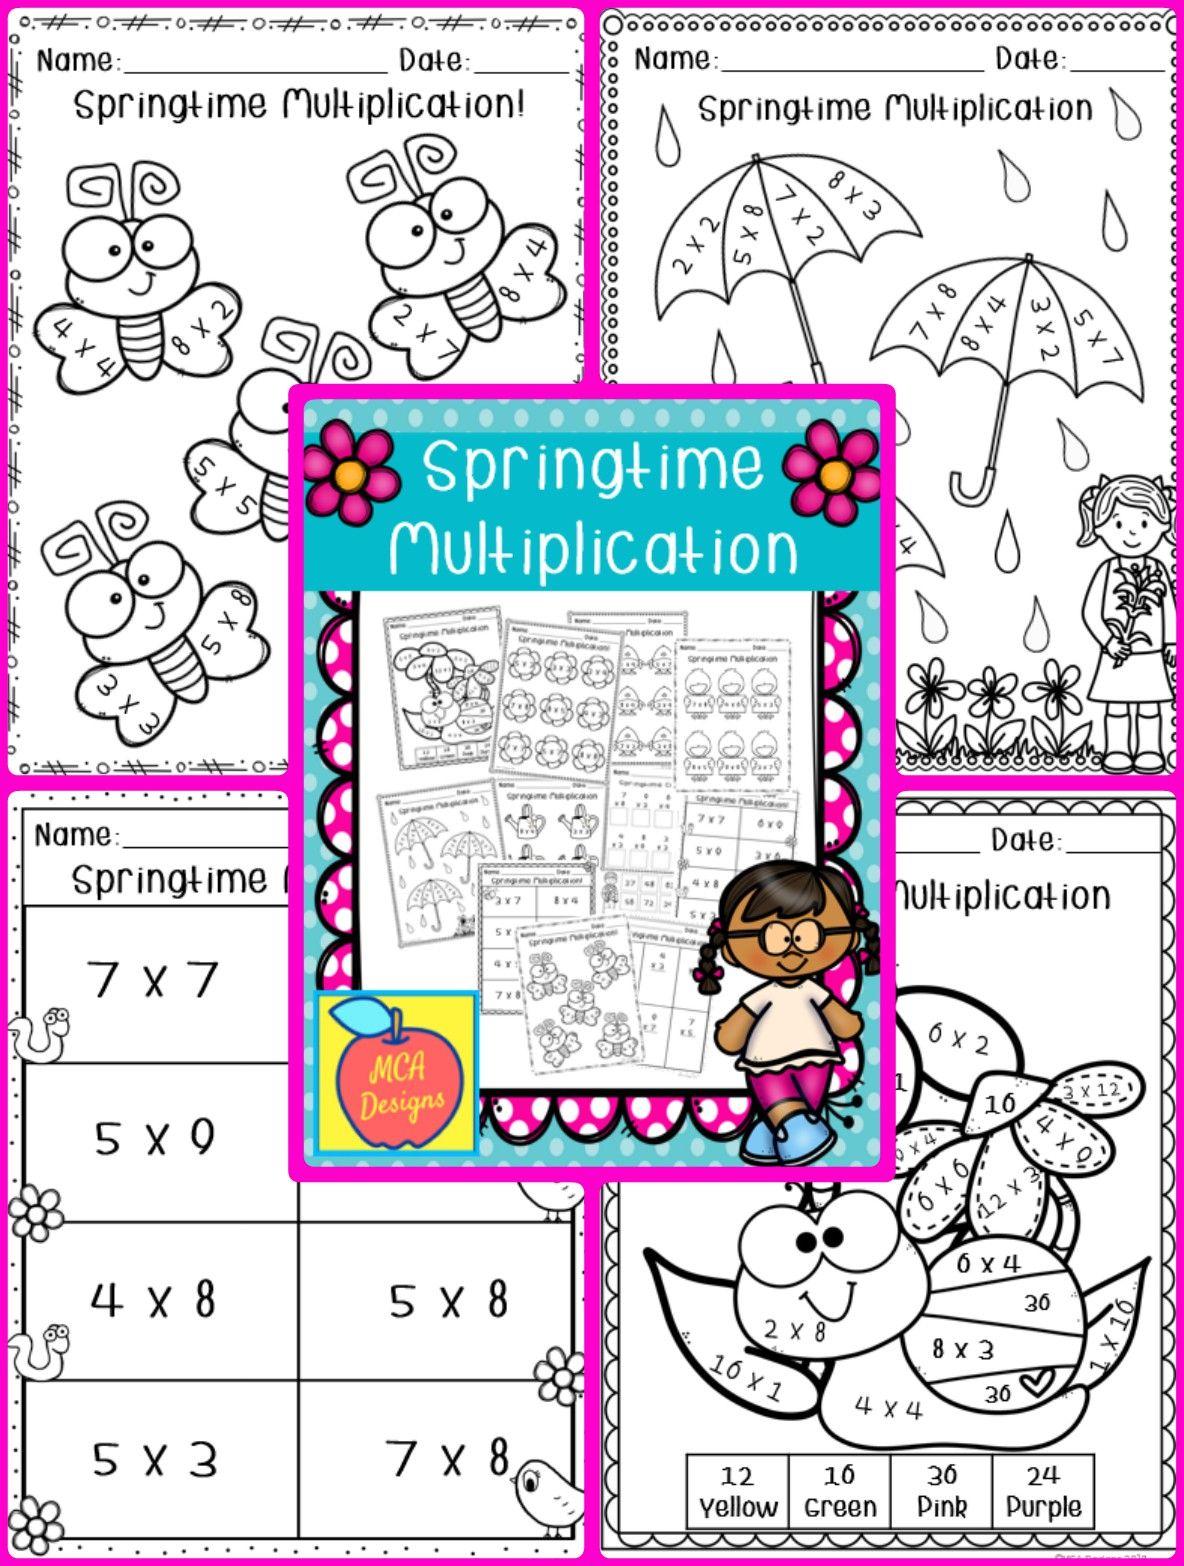 Springtime Multiplication